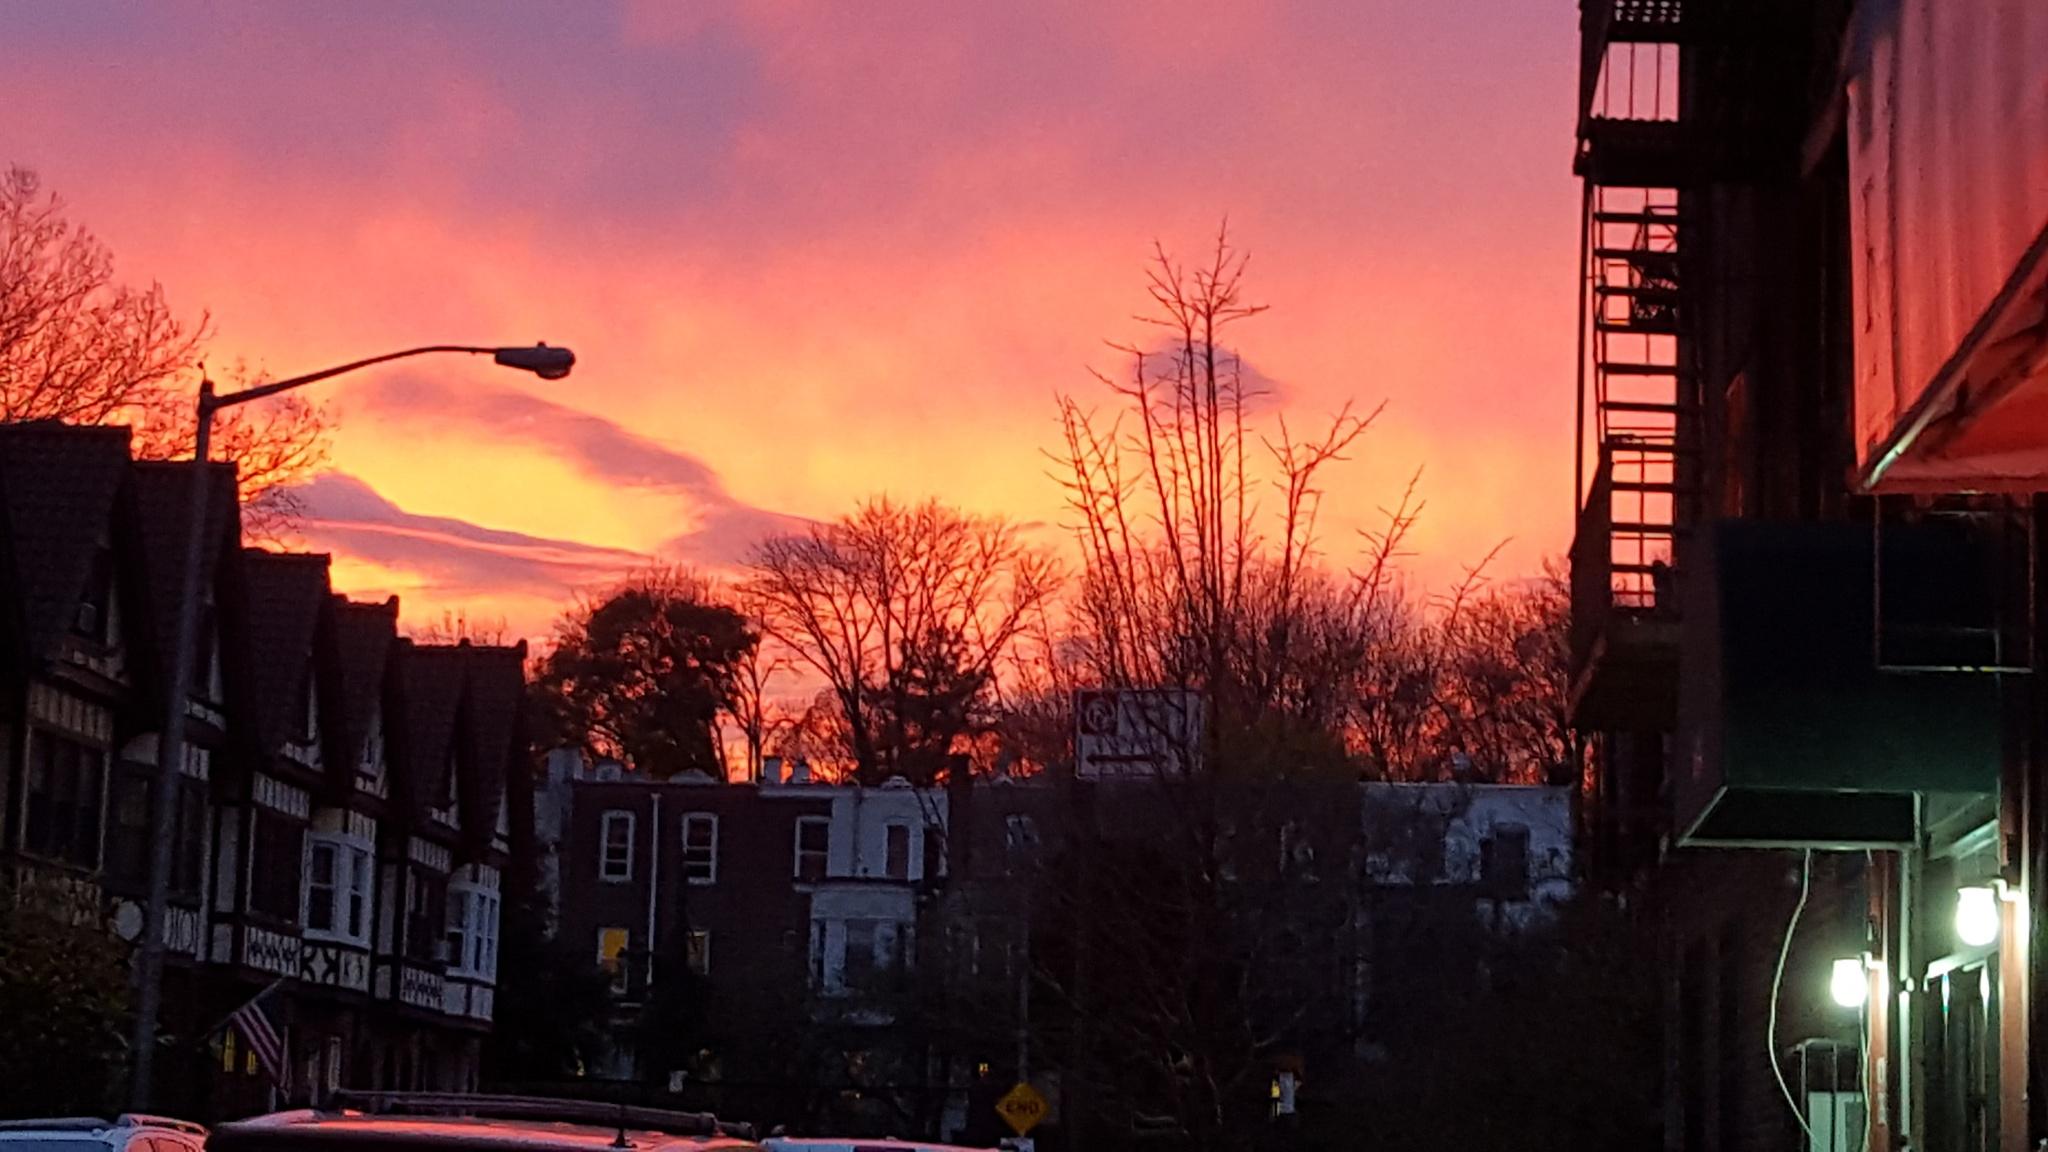 Sunset by waltermar48